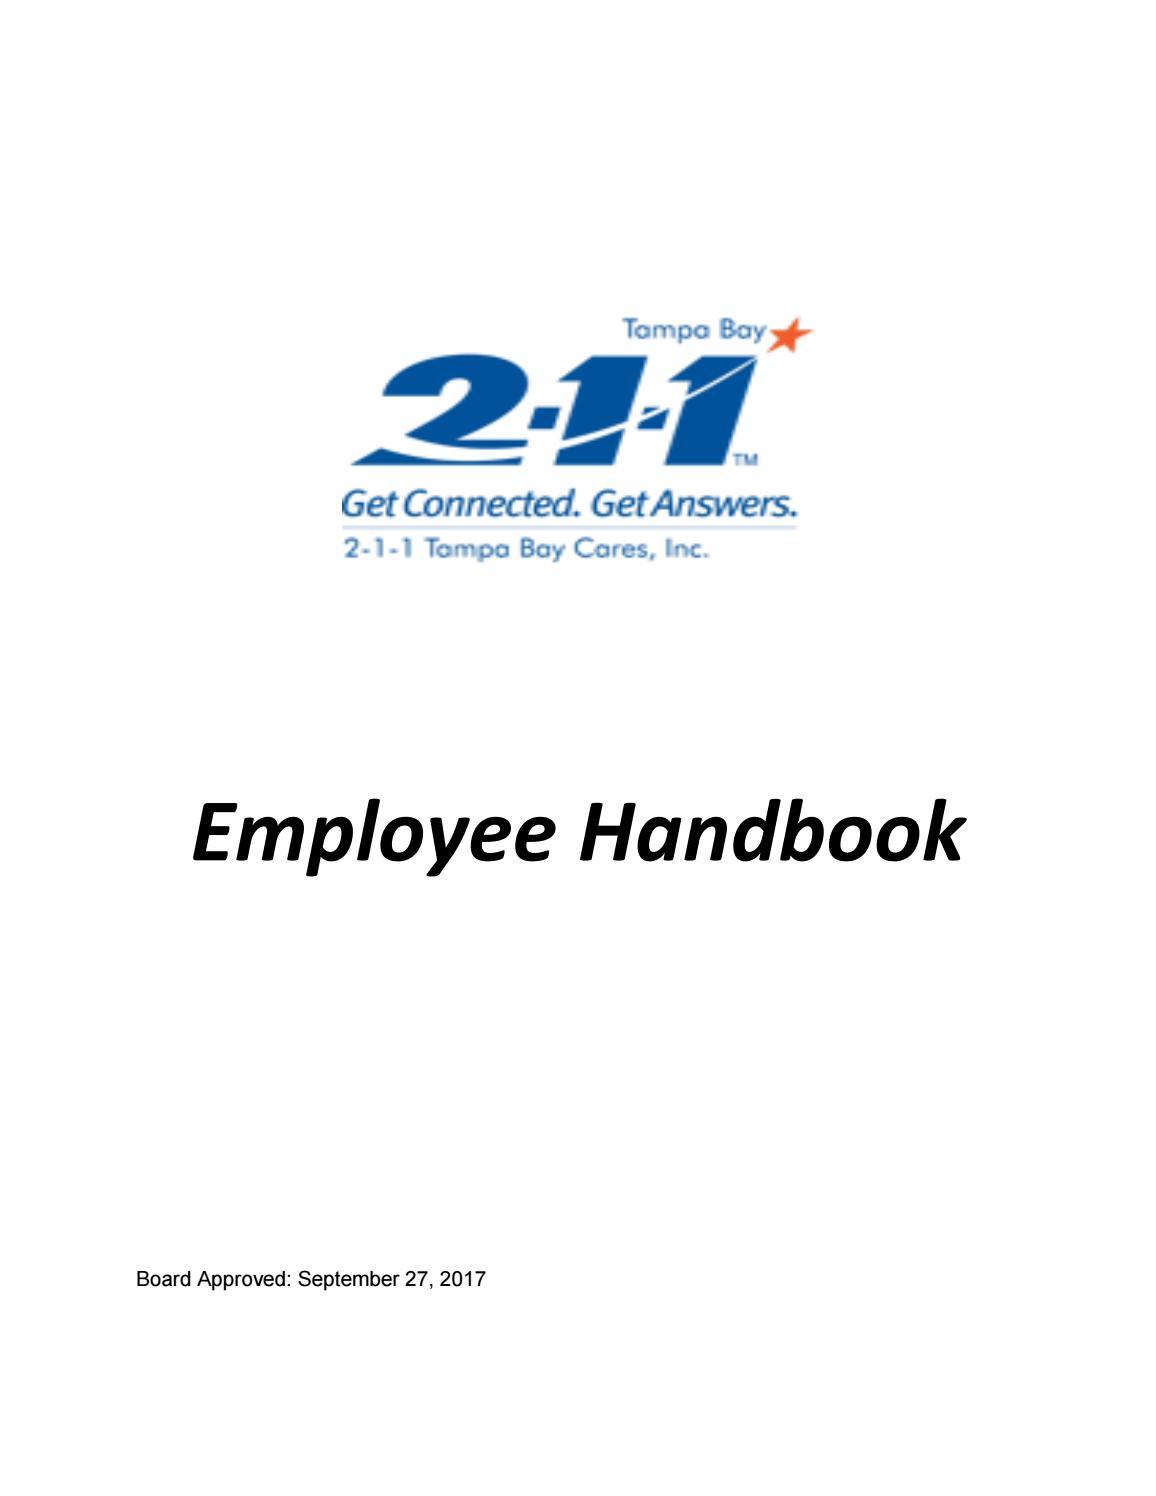 211 TBC Employee Handbook Update October 2017 by Edward